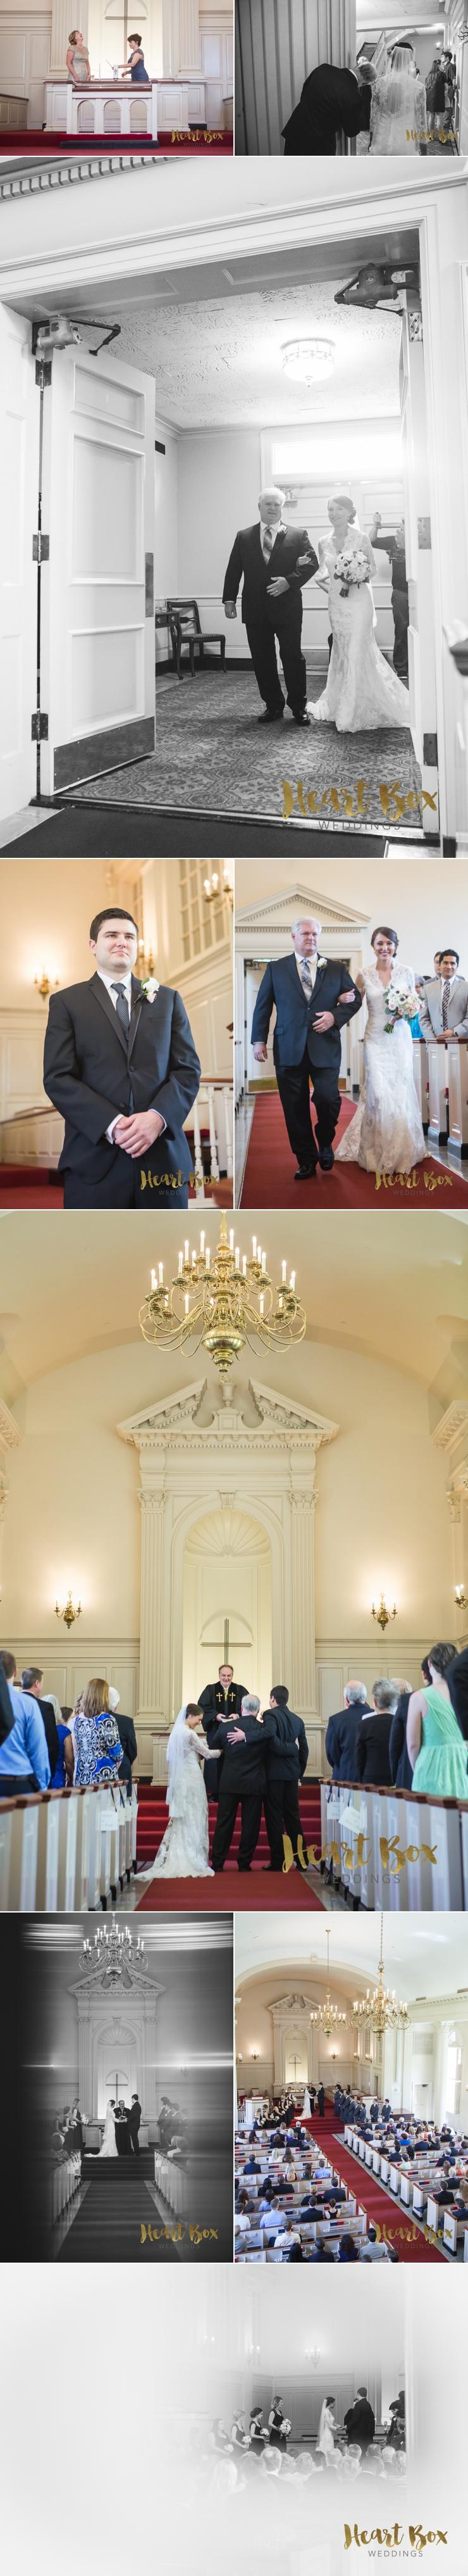 Fegan Wedding Blog Collages 6.jpg